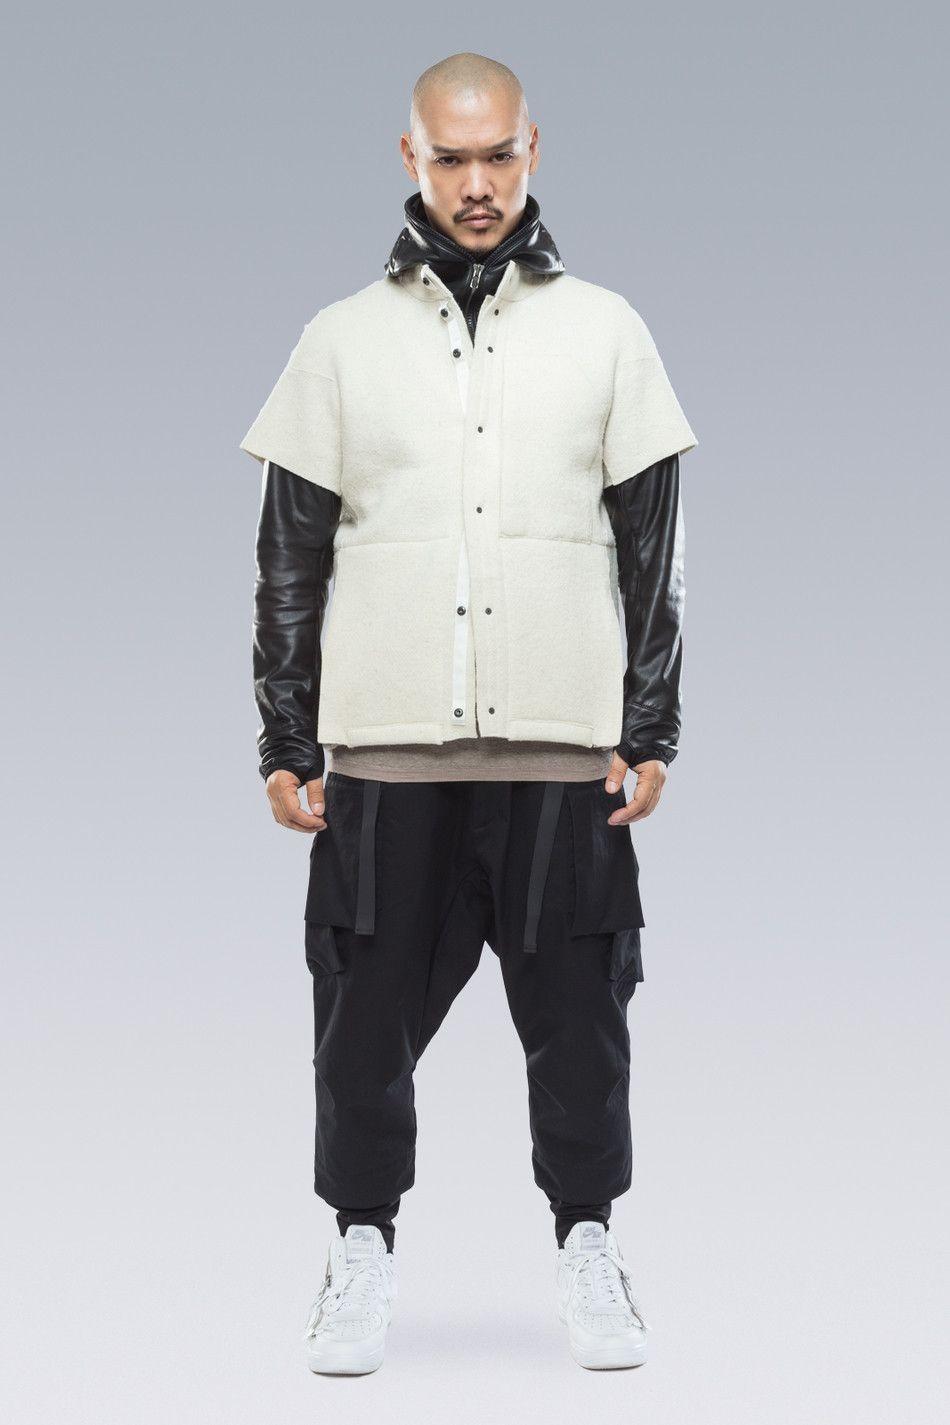 techwear-outdoor-brands-12.jpg